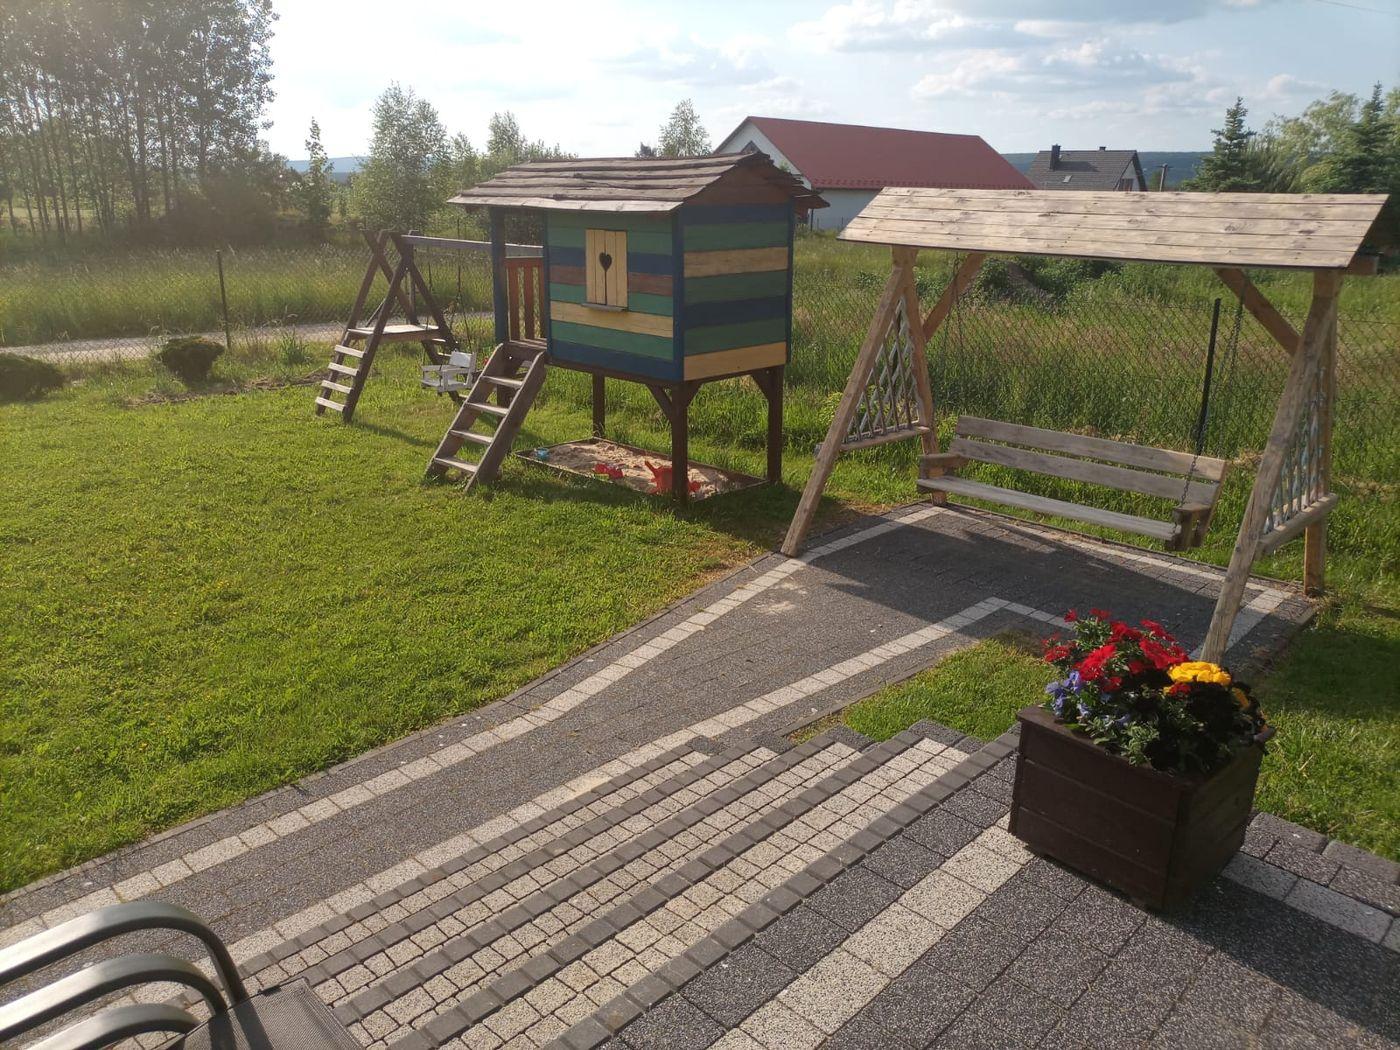 jagodowy-domek-lato_3